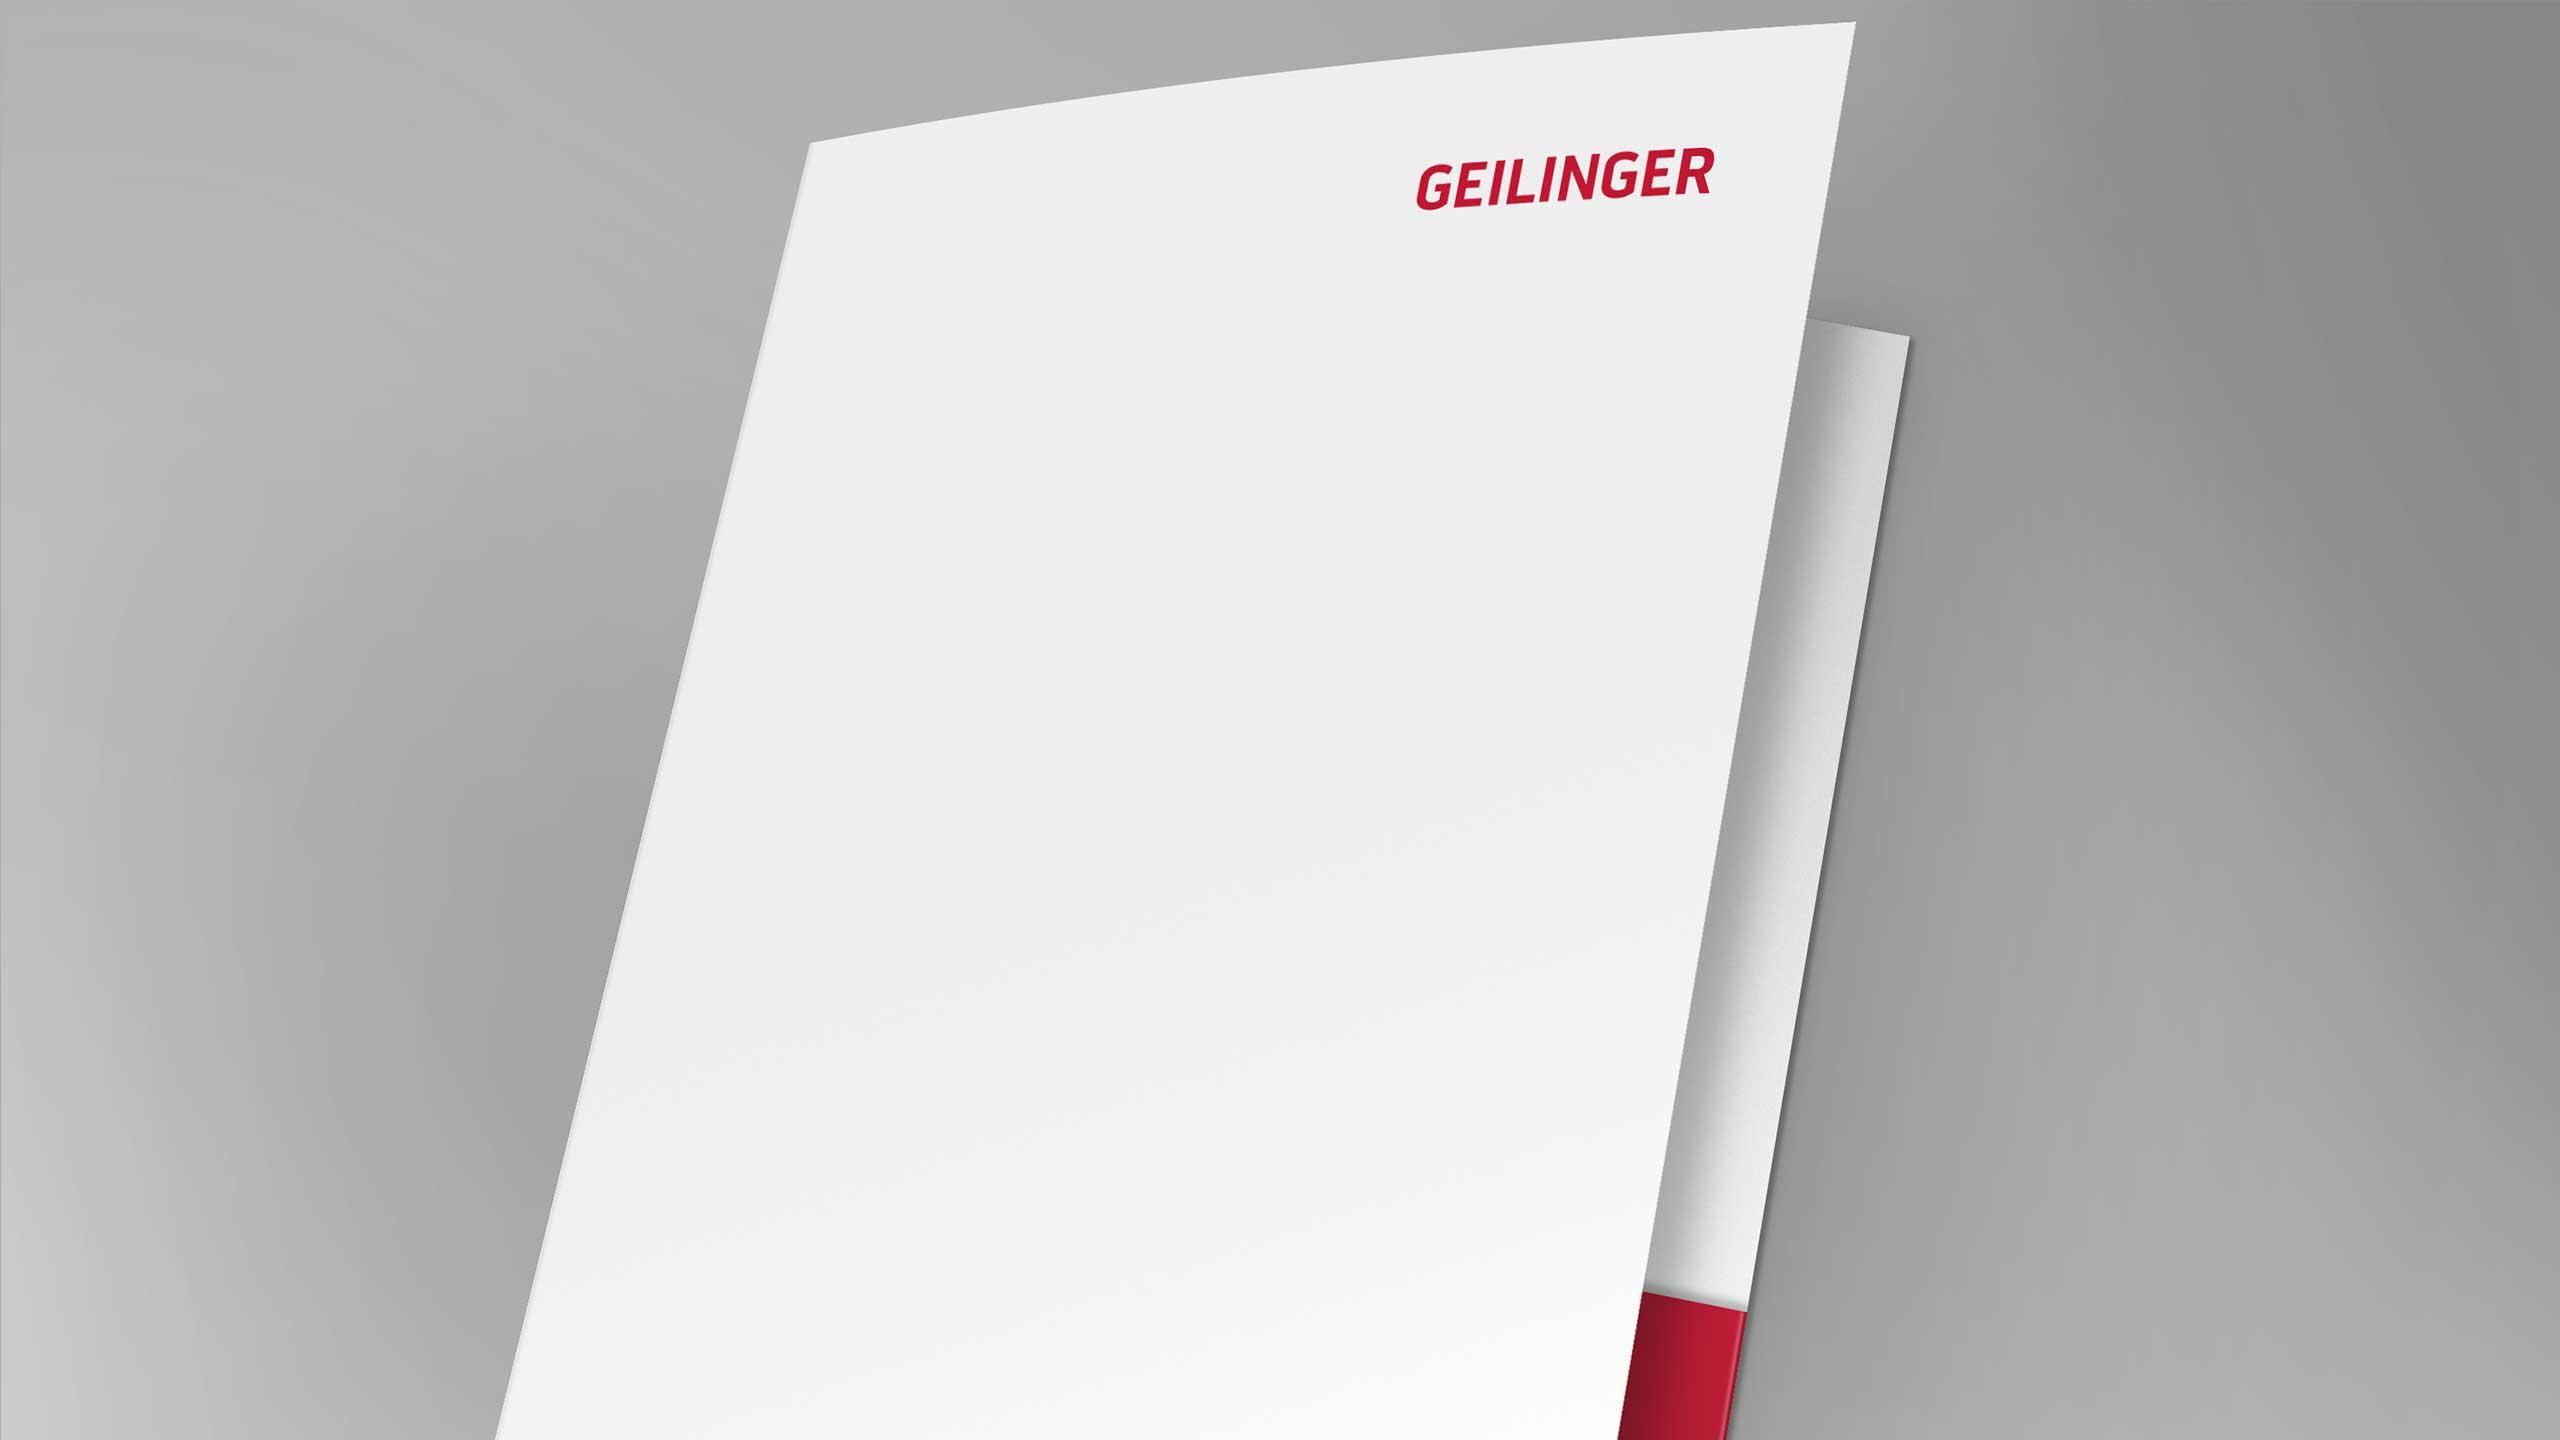 geilinger-05